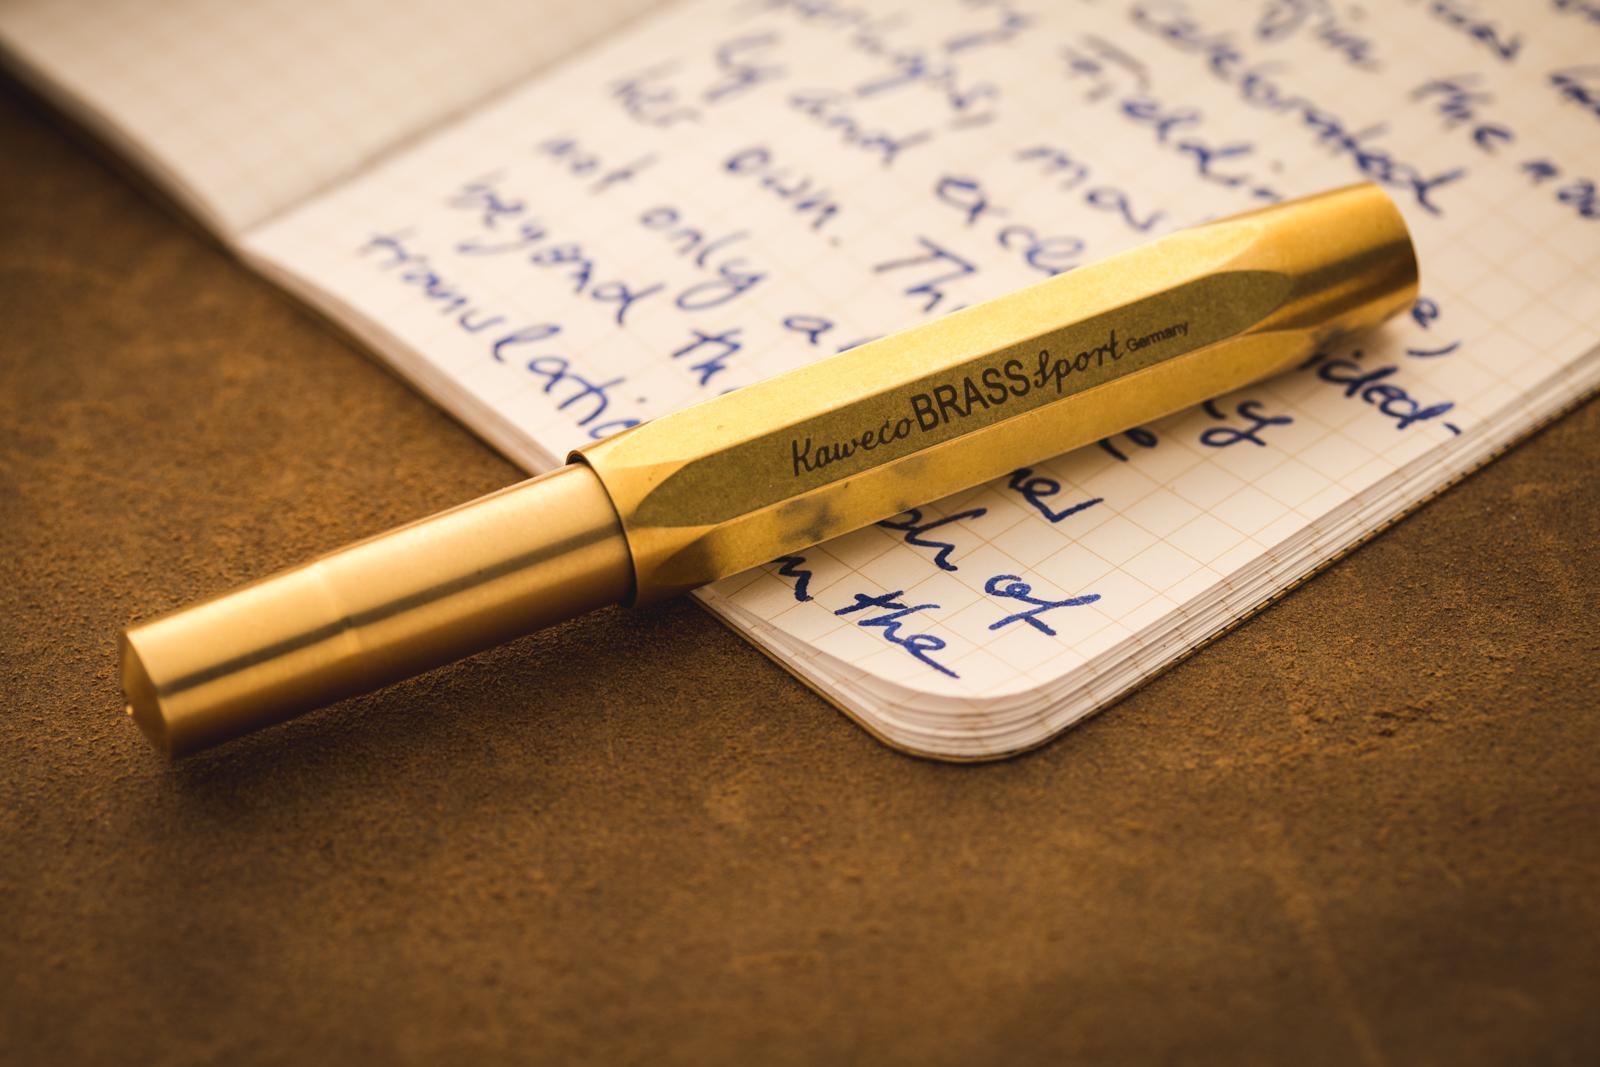 Kaweco - Brass Sport Fountain Pen